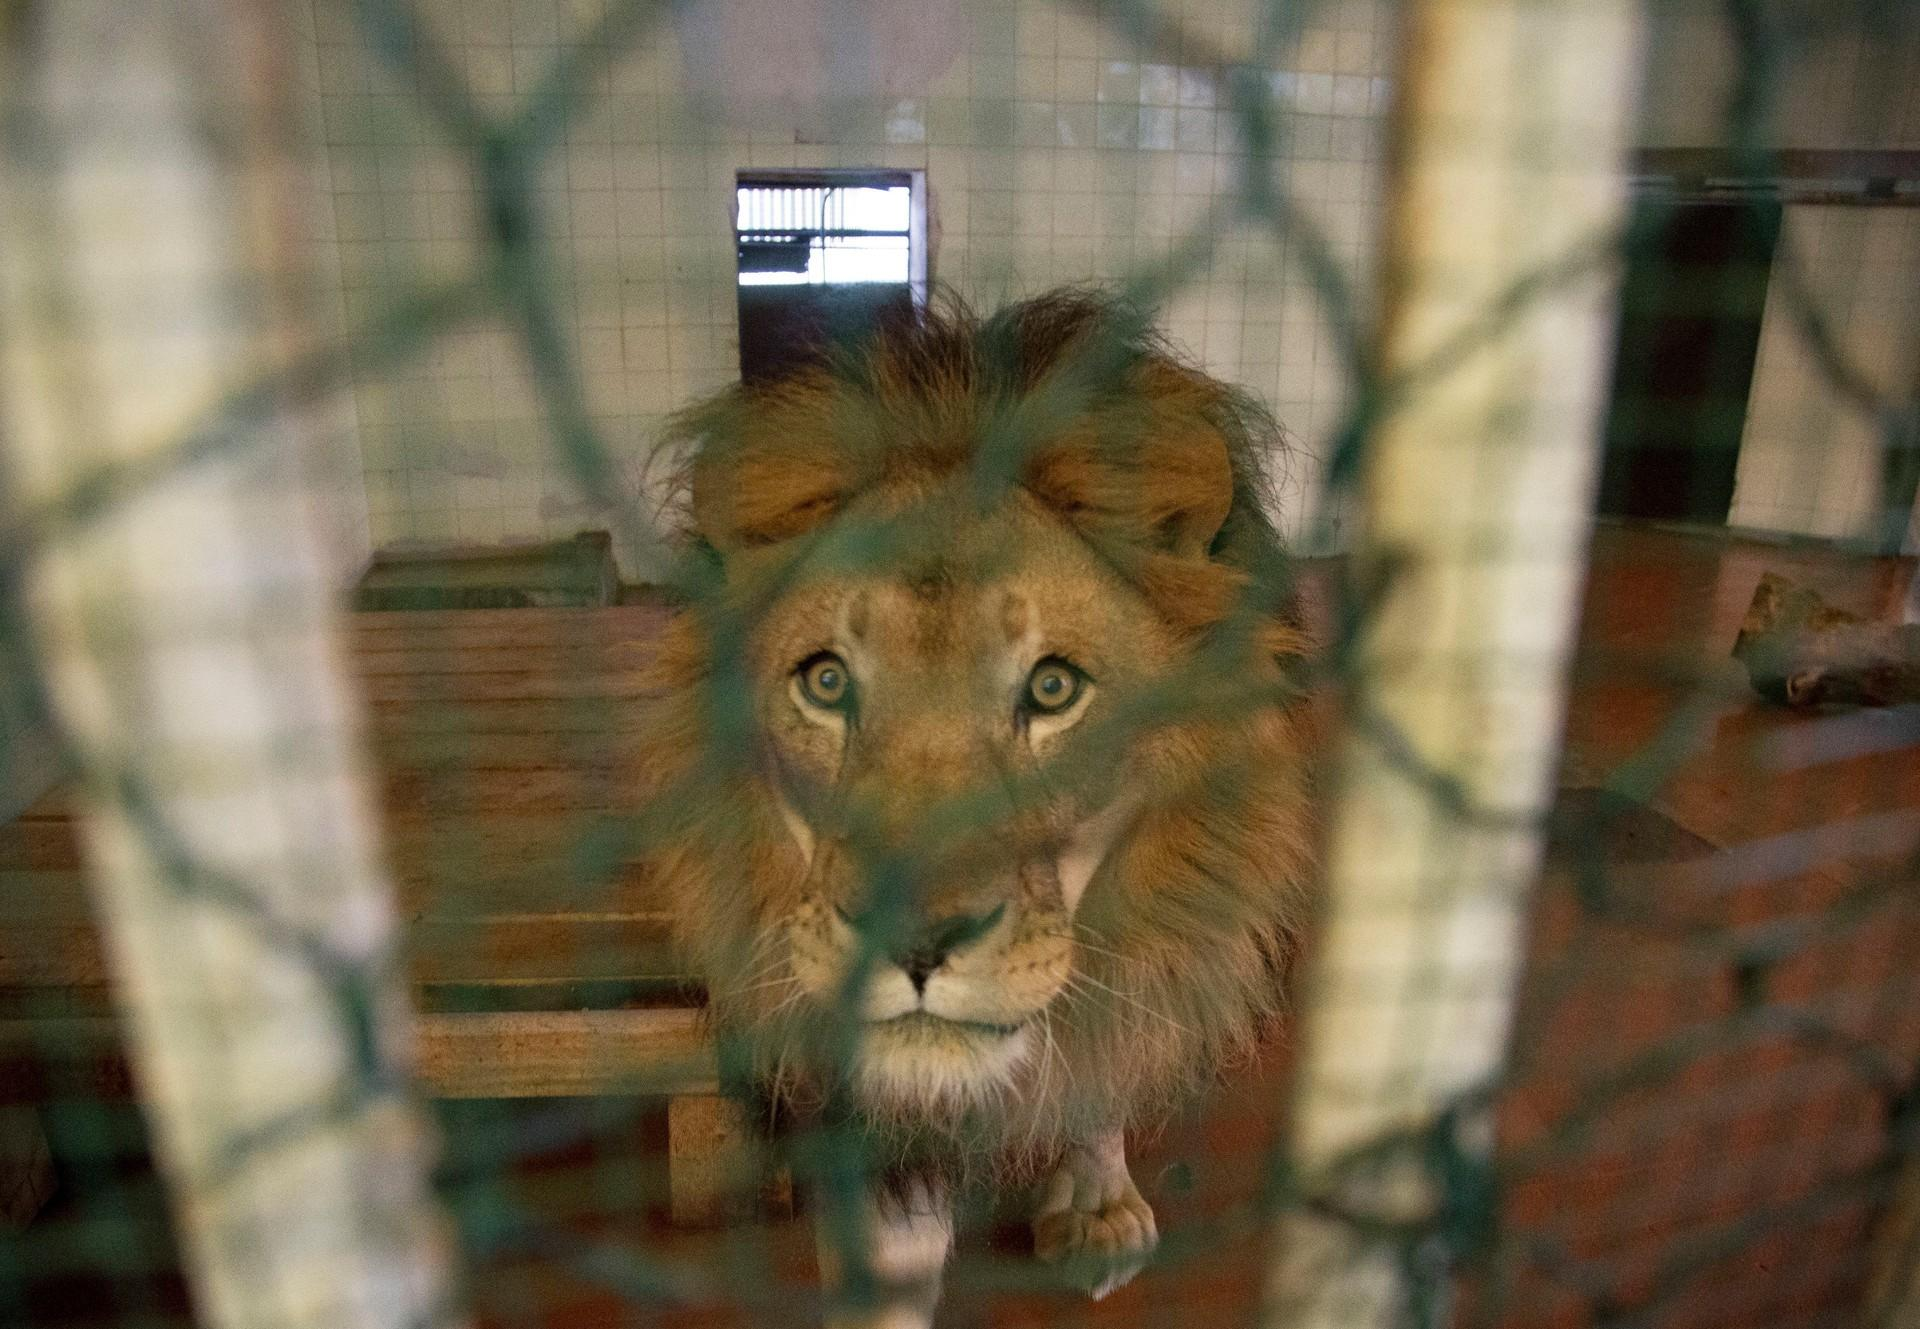 Geretteter Löwe in Albanien